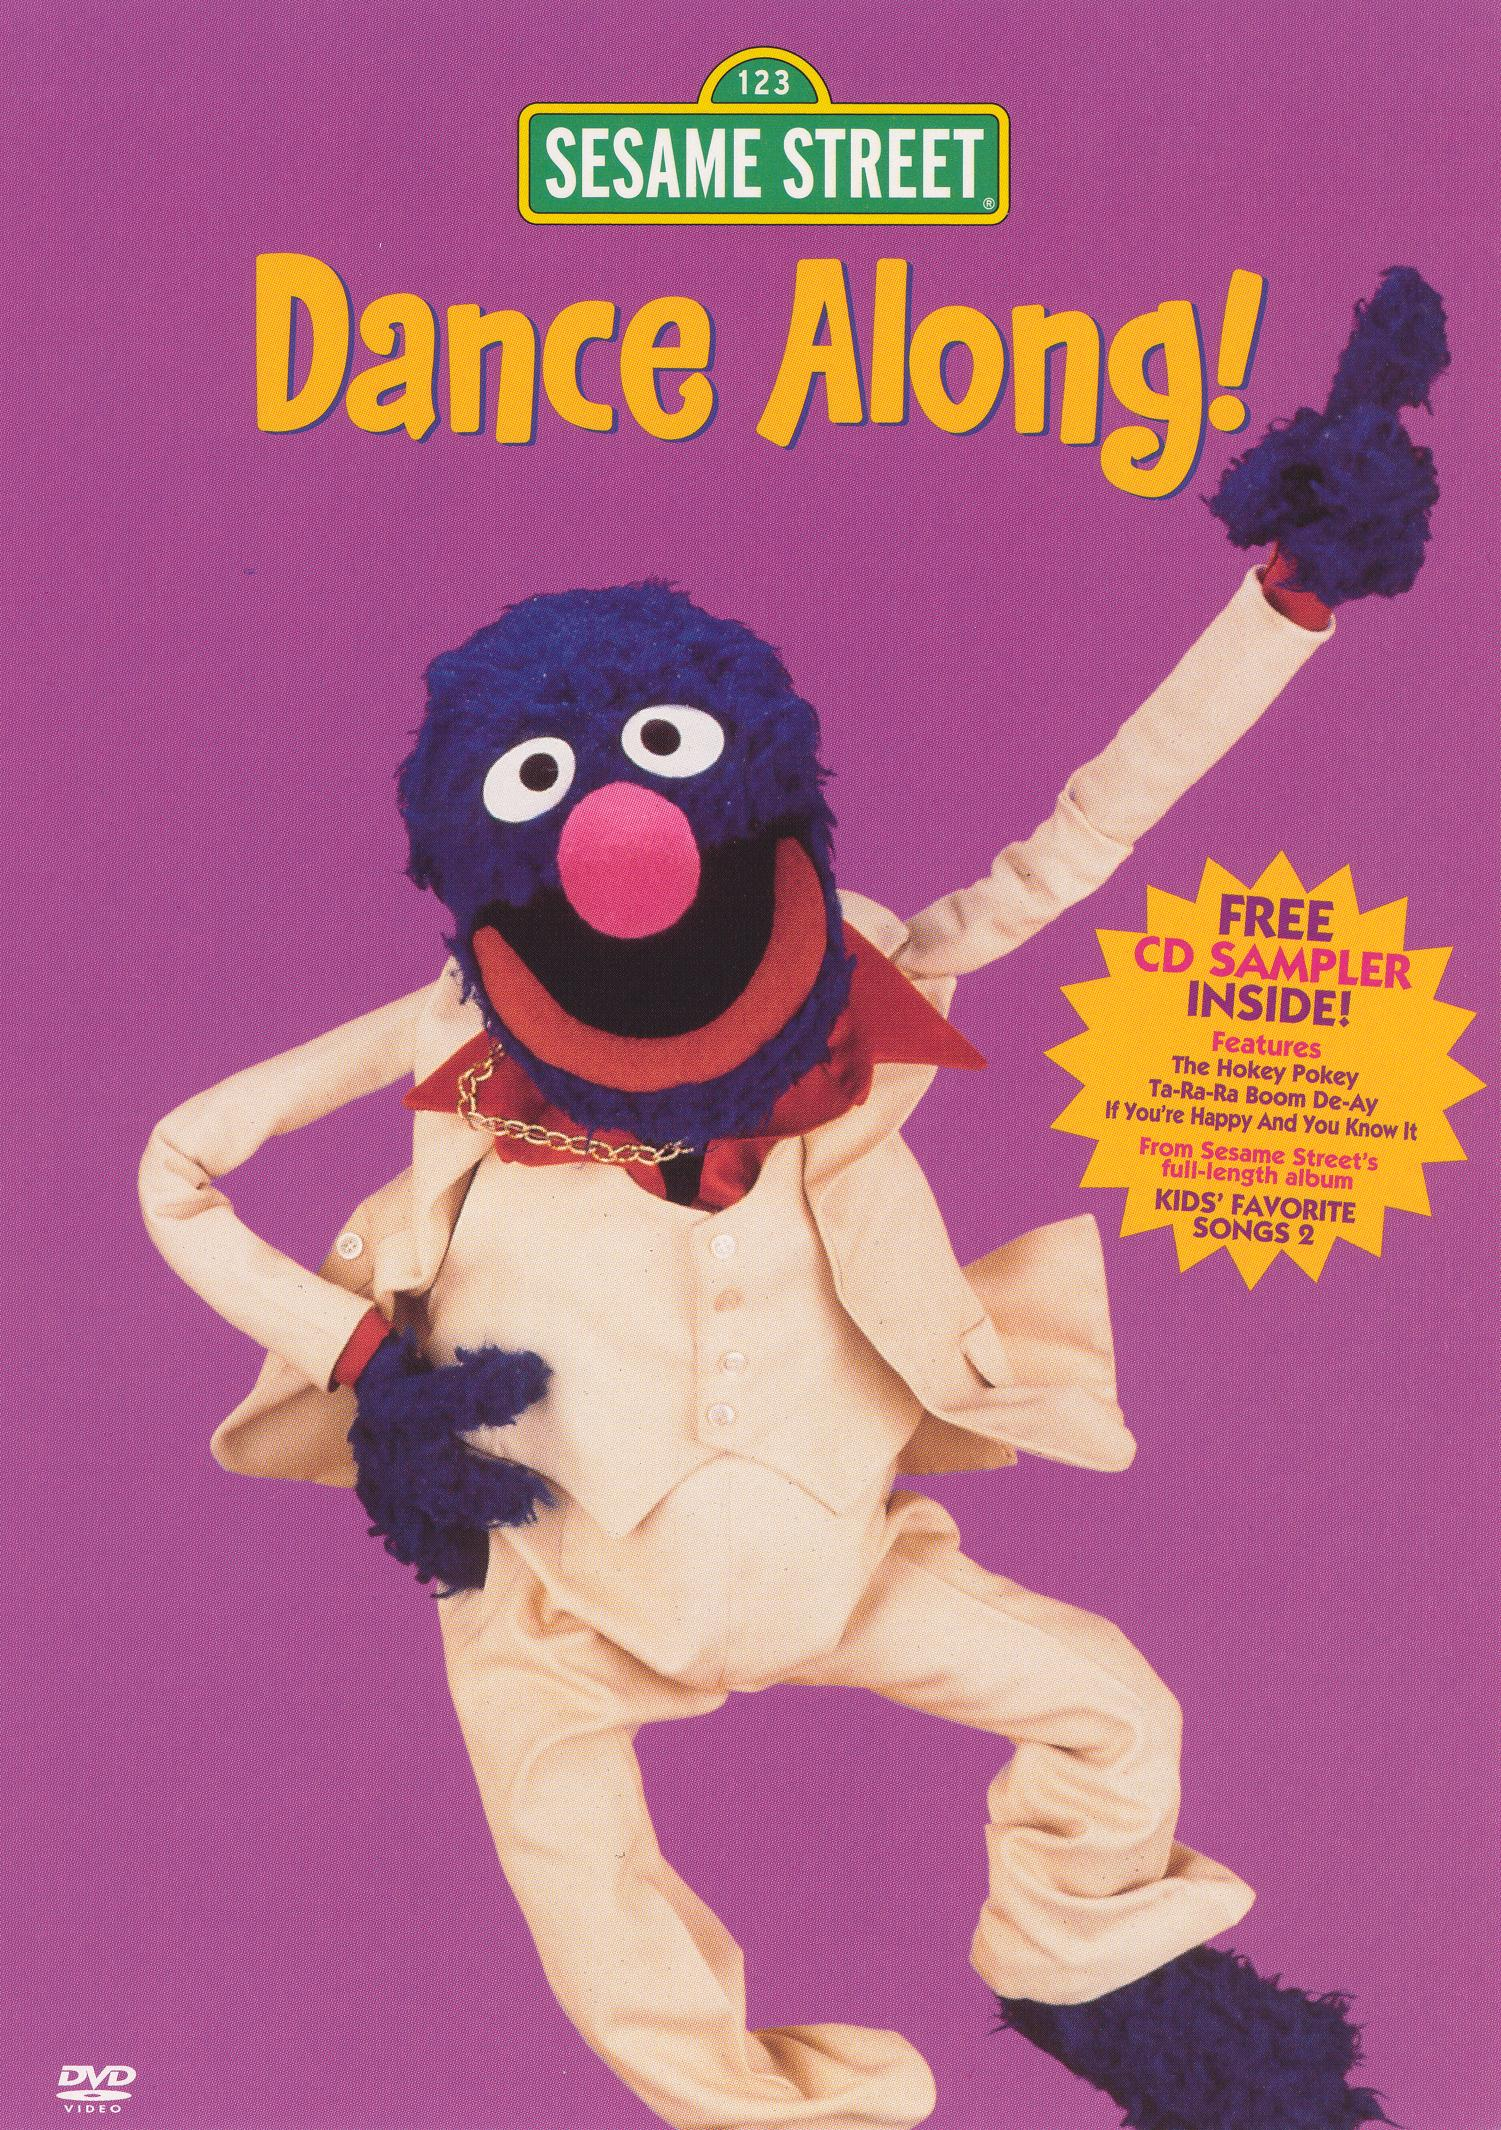 Sesame Street: Dance Along!